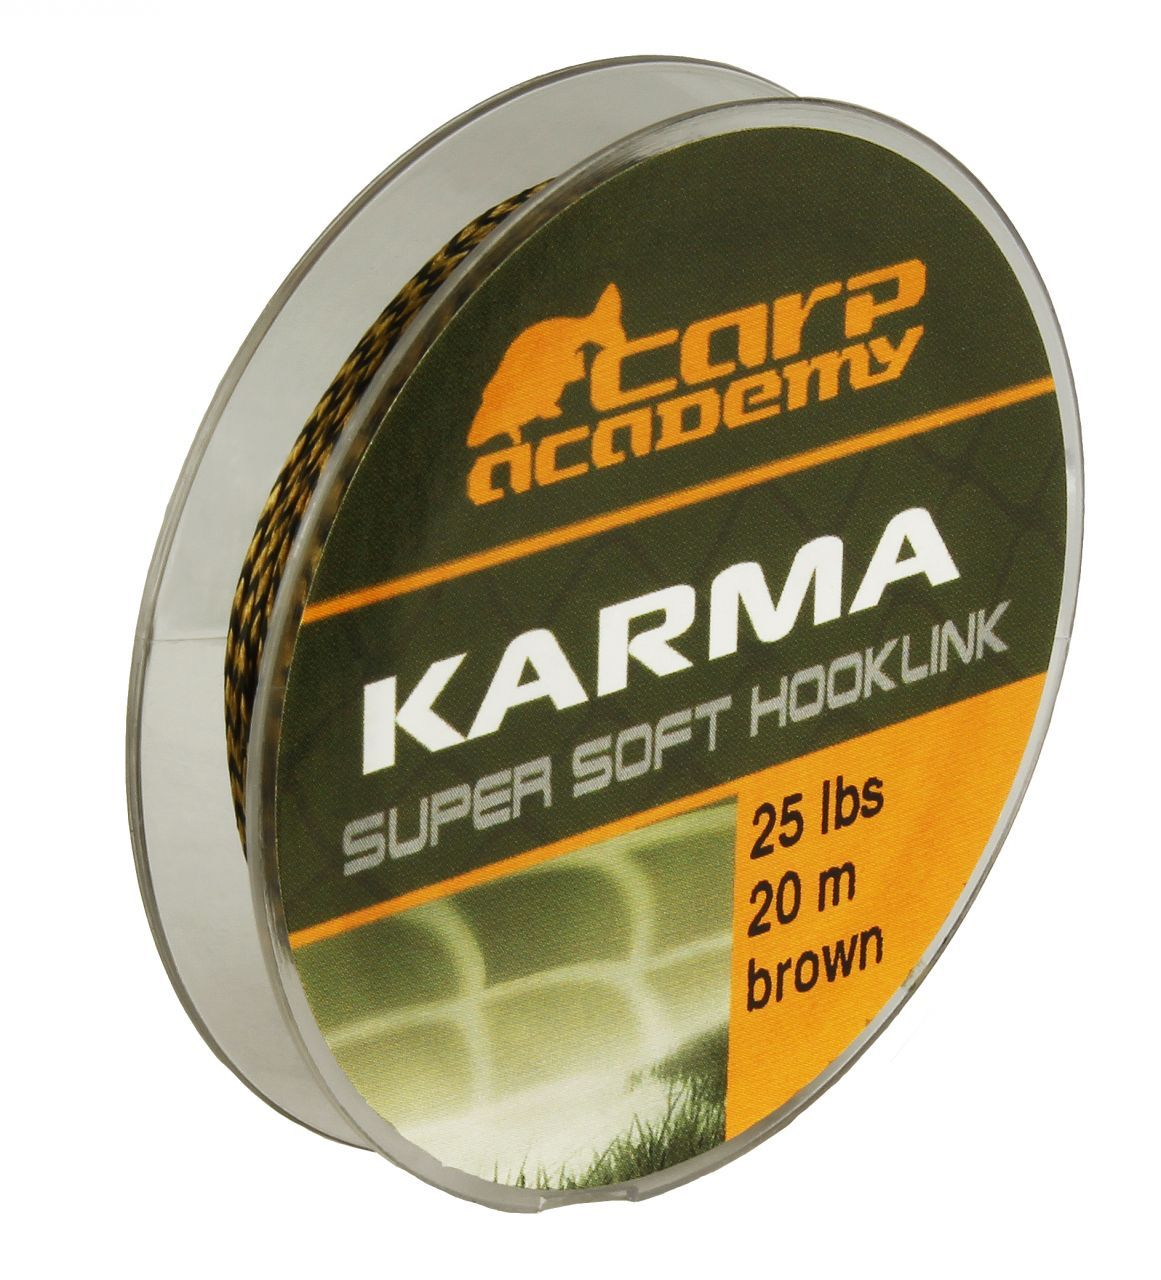 Carp Academy Karma Hooklink